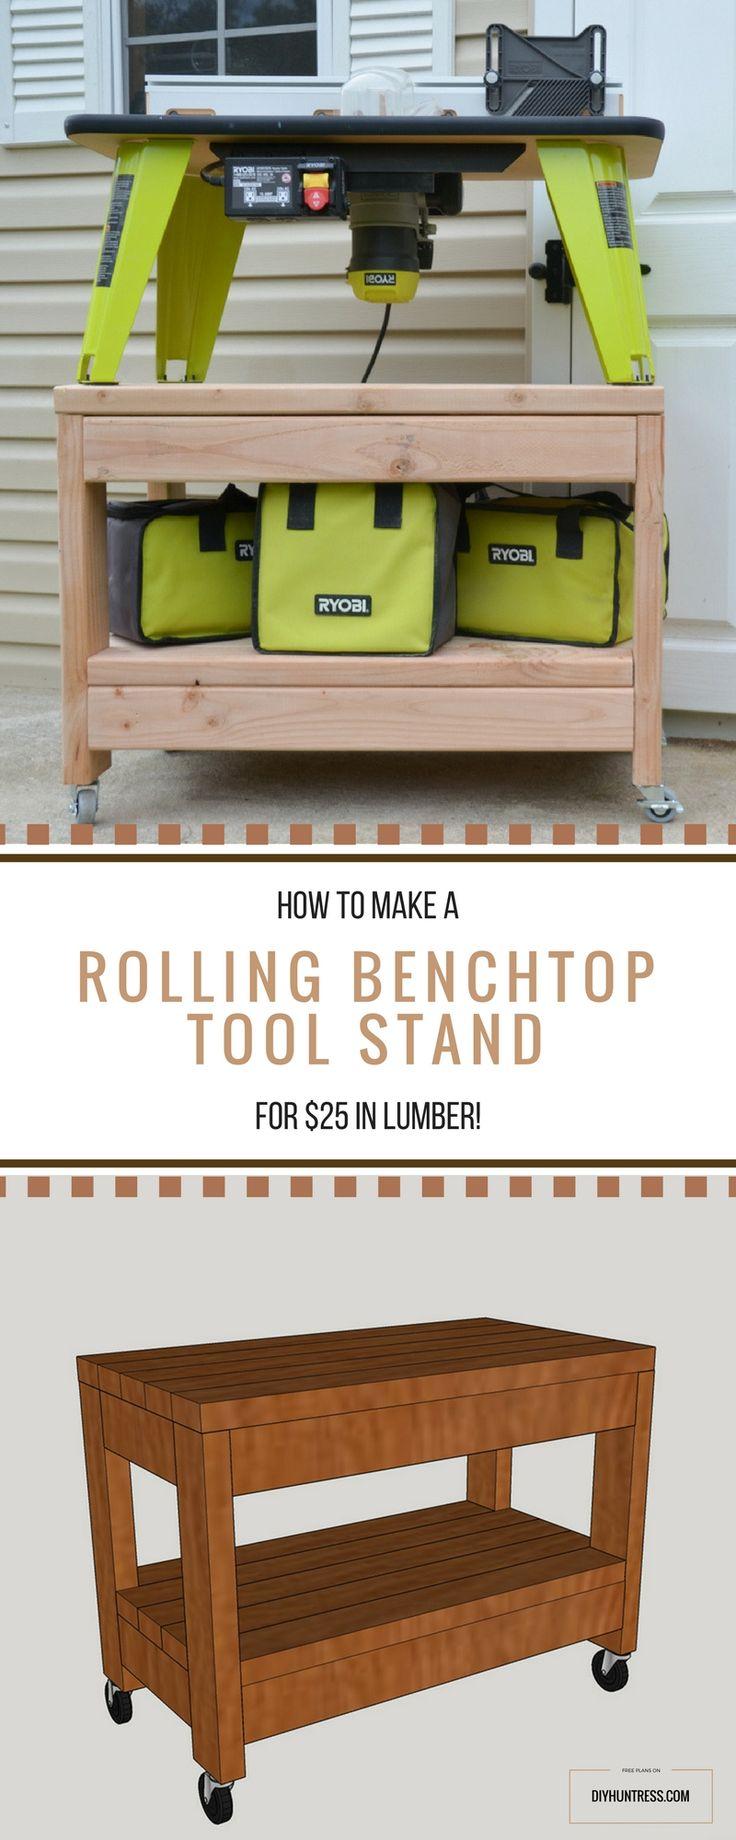 DIY Rolling Benchtop Tool Stand – DIY Huntress